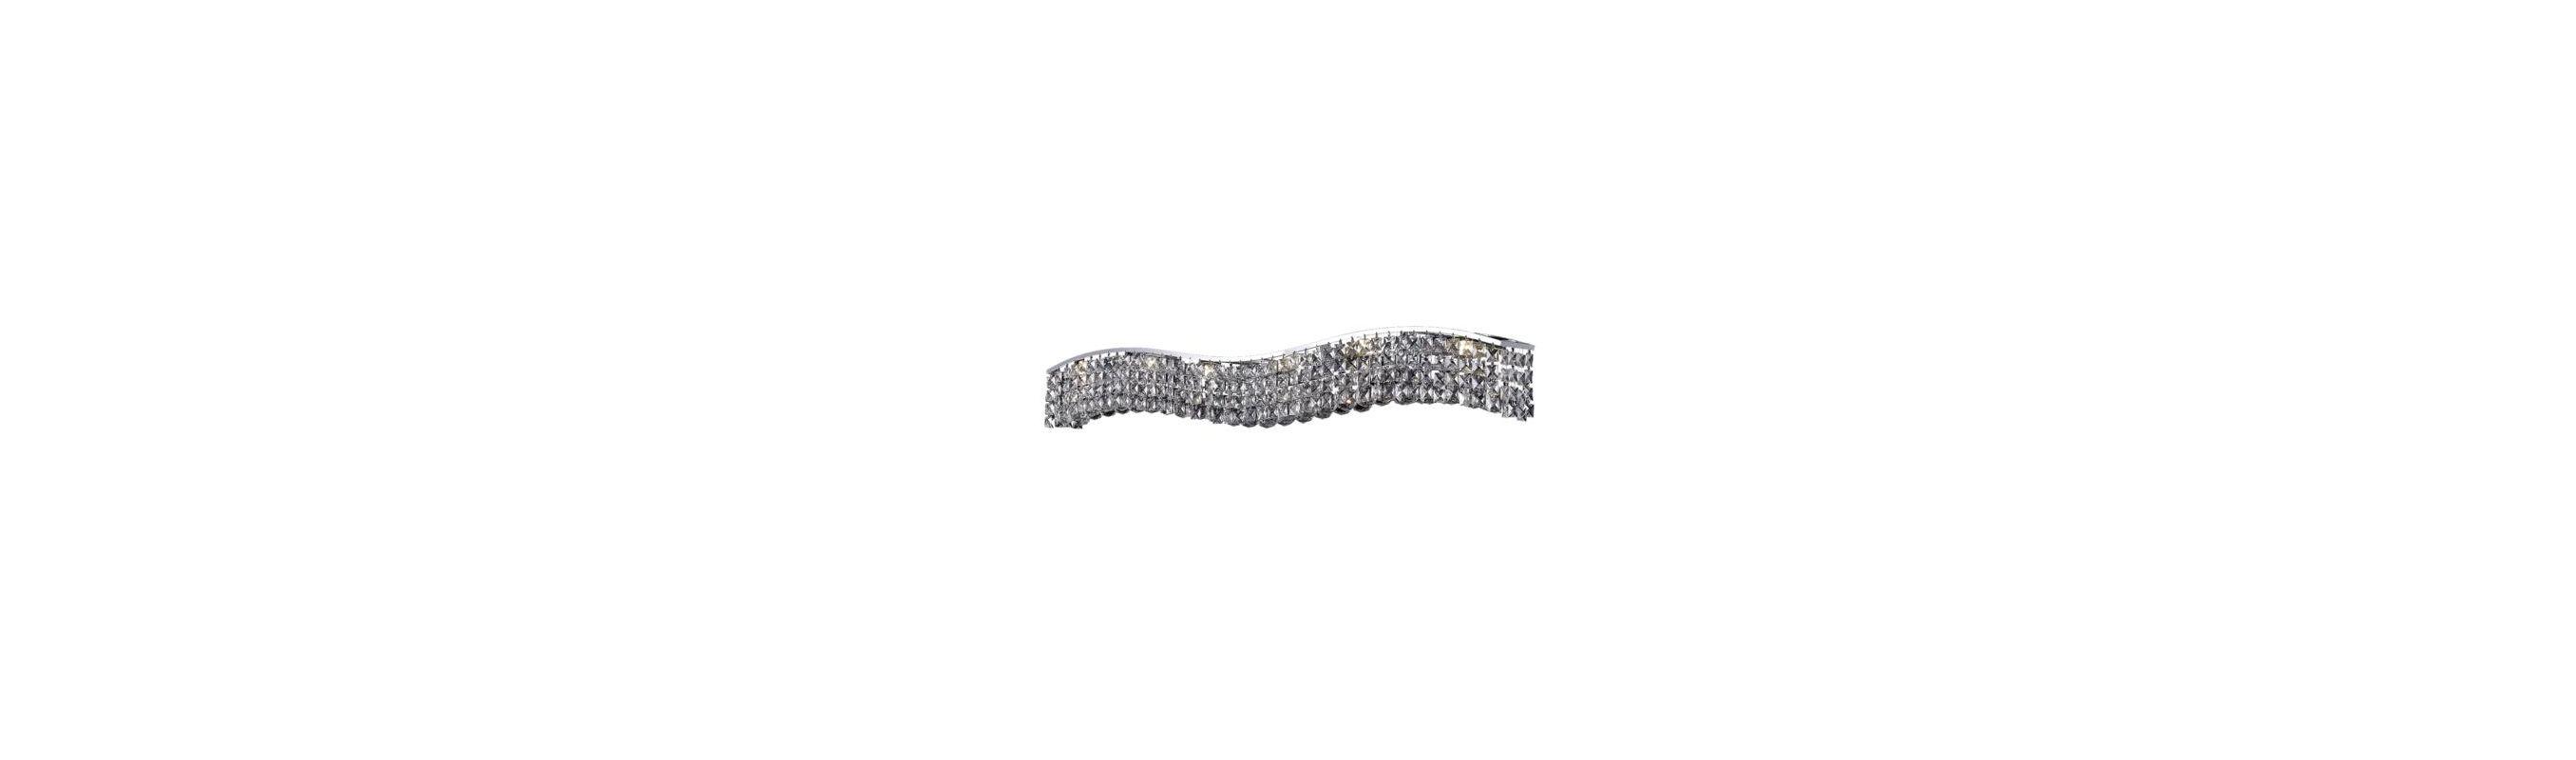 Elegant Lighting 2041W44C Contour 10-Light Crystal Wall Sconce